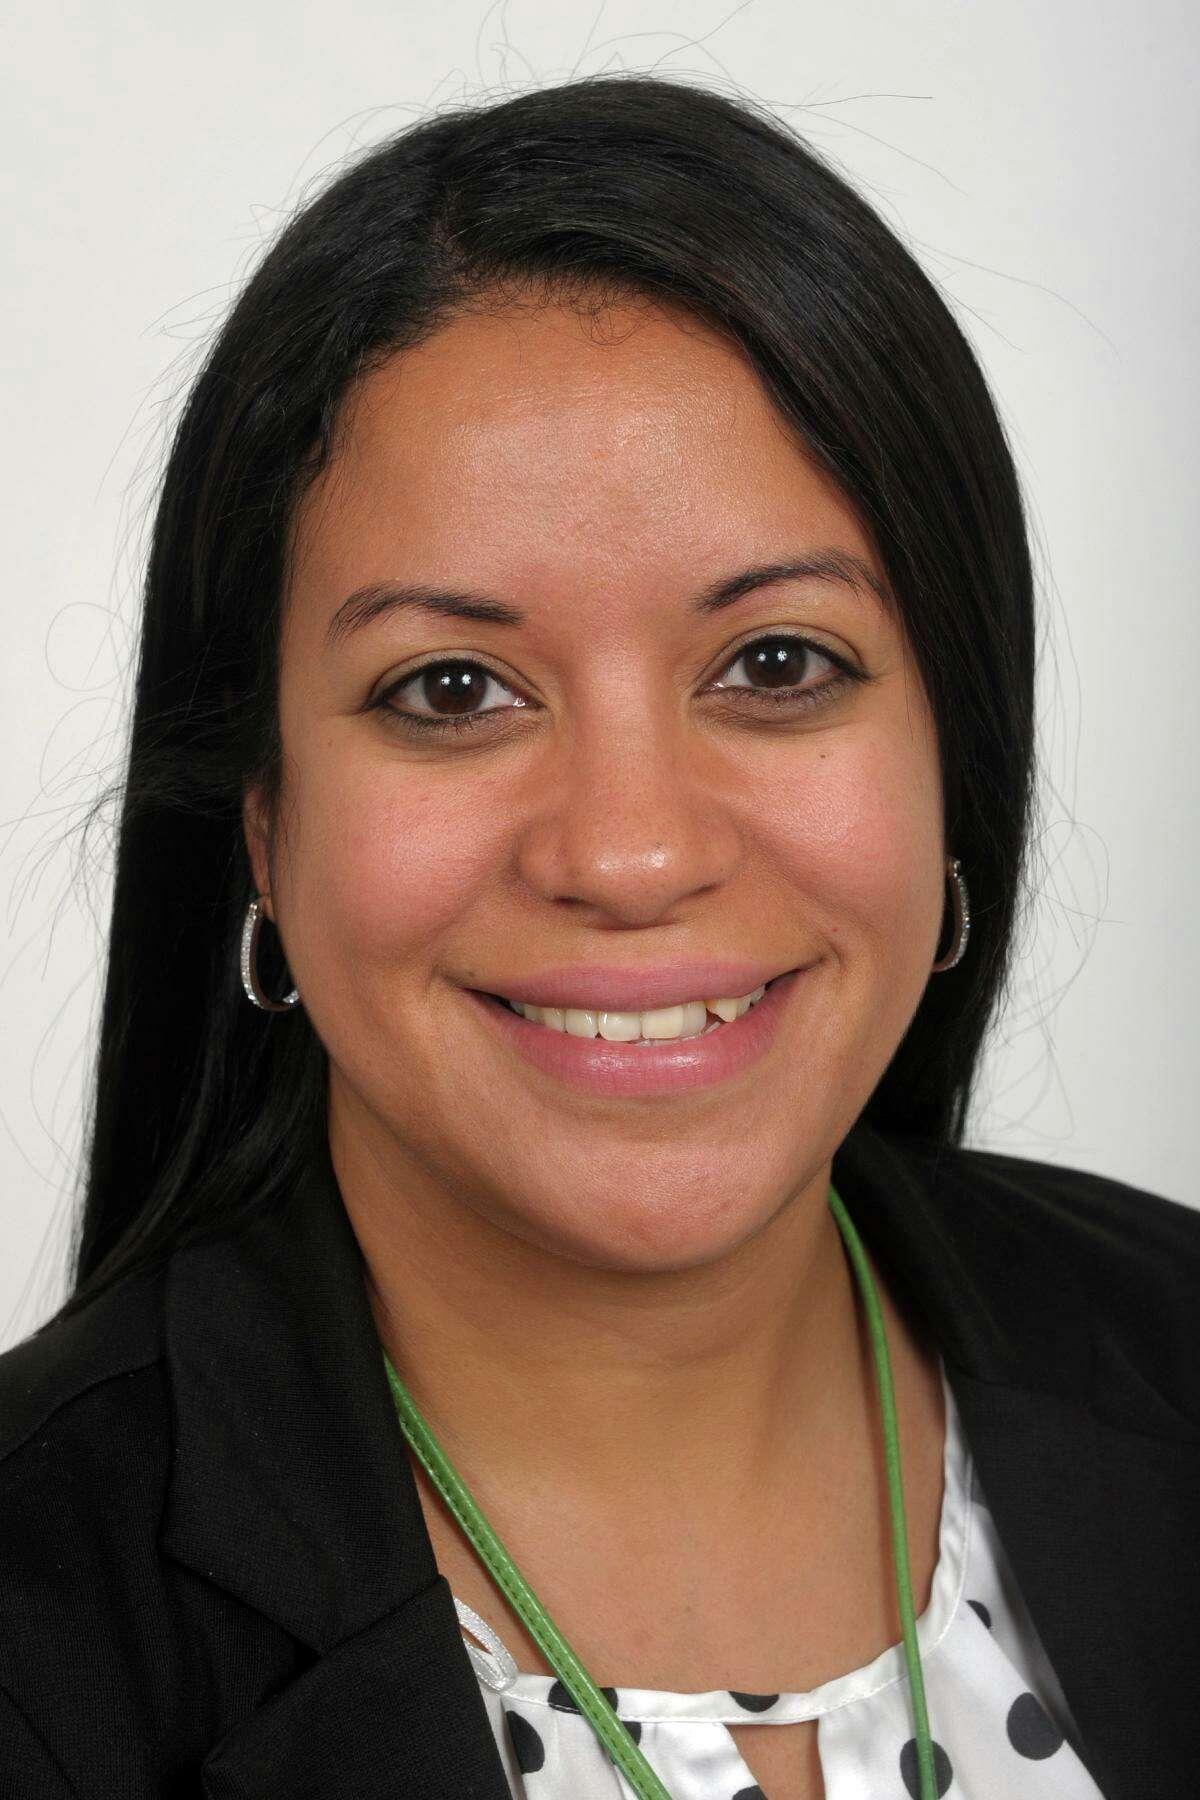 Keila Torres Ocasio has been named managing editor of the Connecticut Post, Bridgeport, Conn. Sept. 9. 2019.